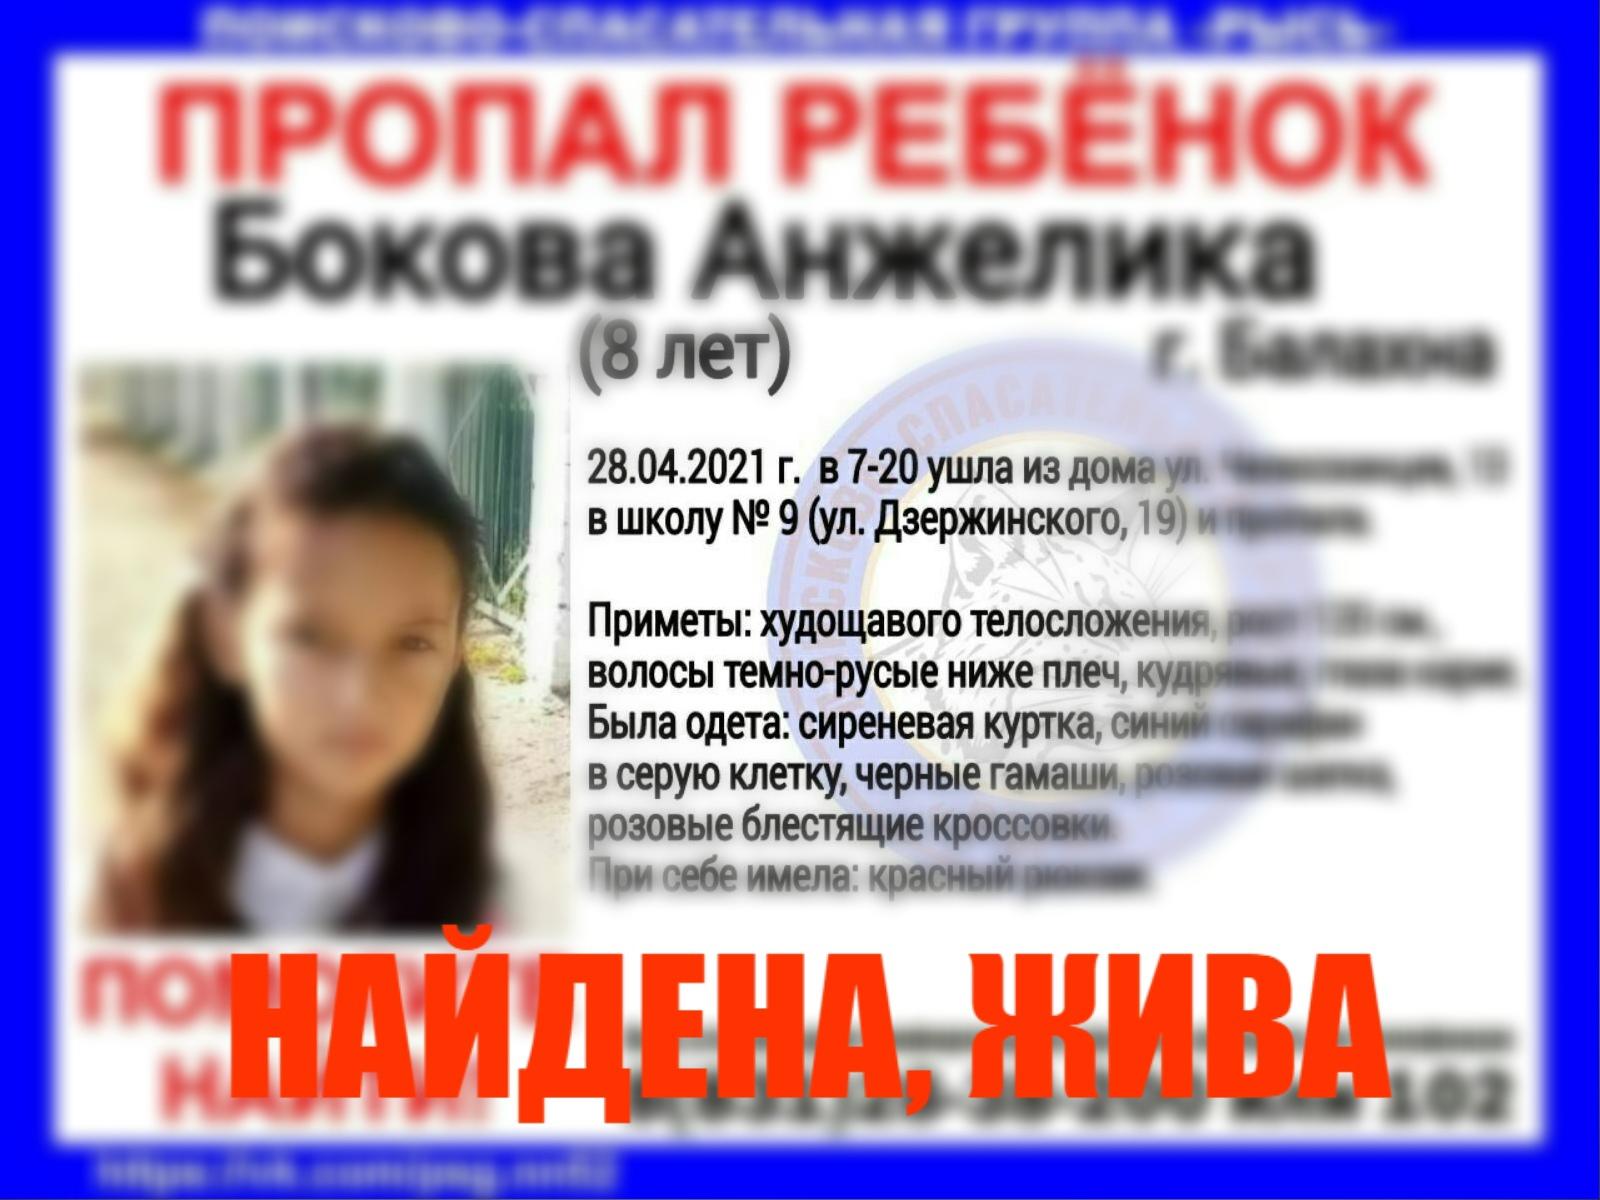 Бокова Анжелика, 8 лет г. Балахна